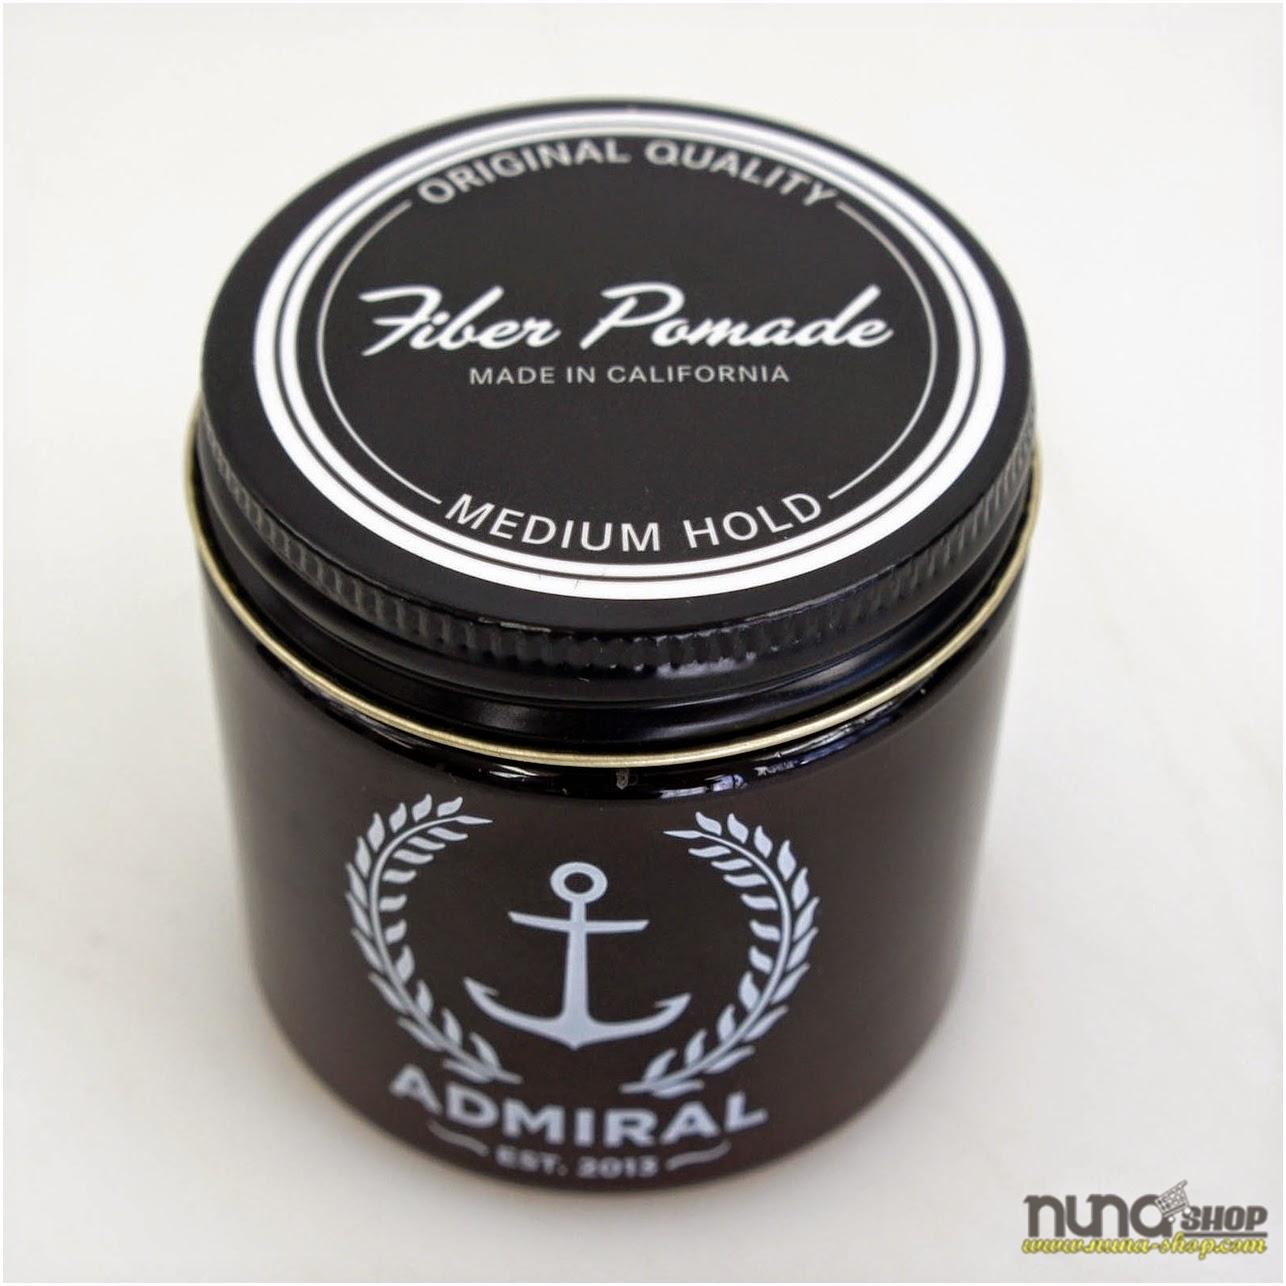 Pomade Admiral Medium Hold Original 100% USA (Waterbase)